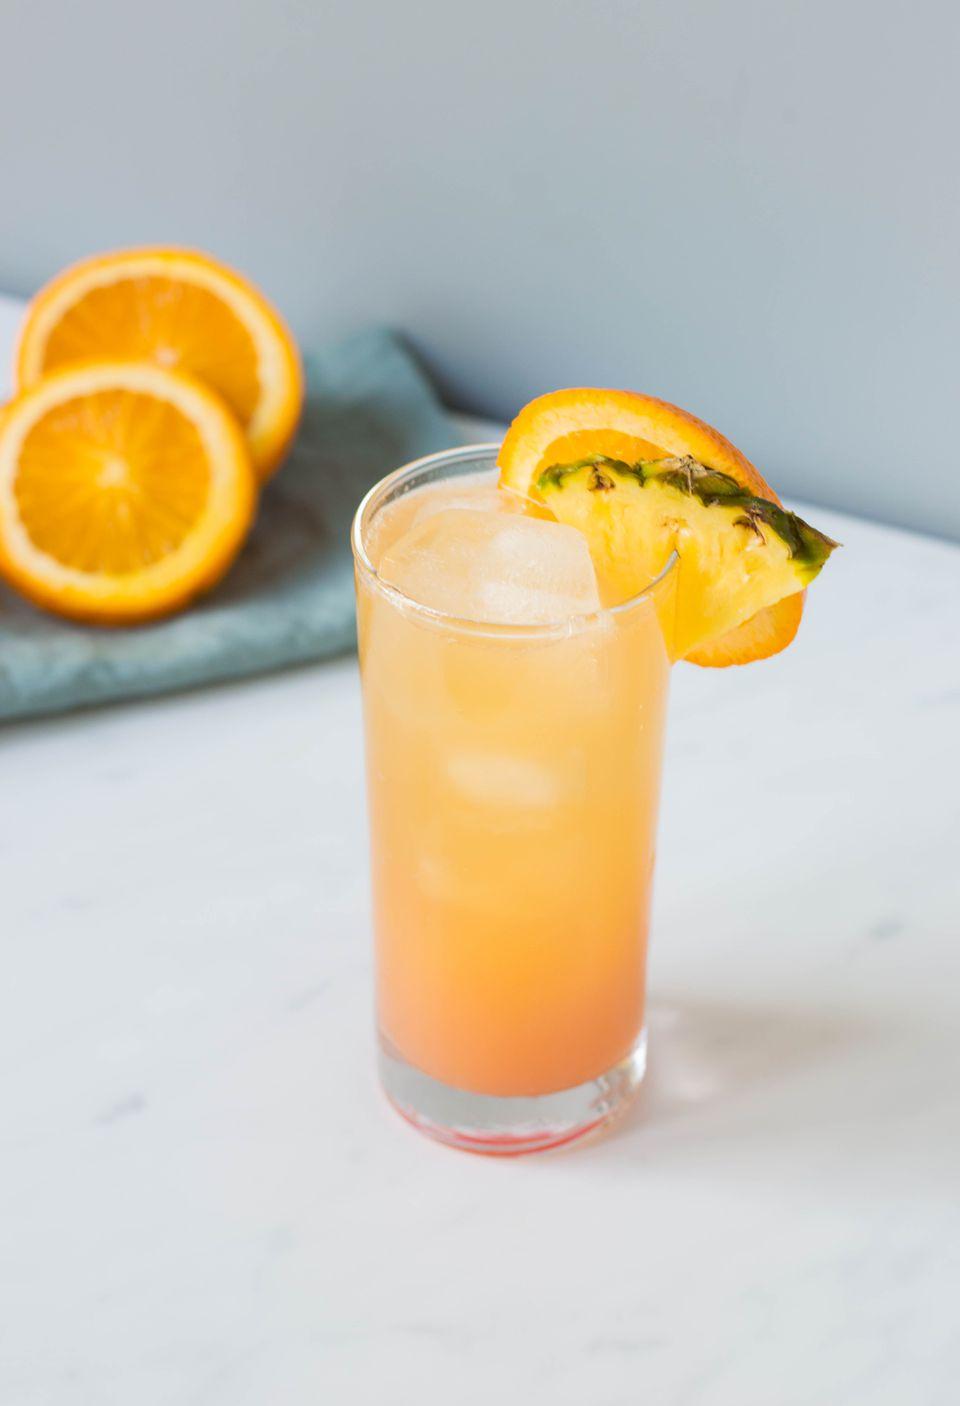 Cinderella non-alcoholic mocktail with orange and pineapple garnish